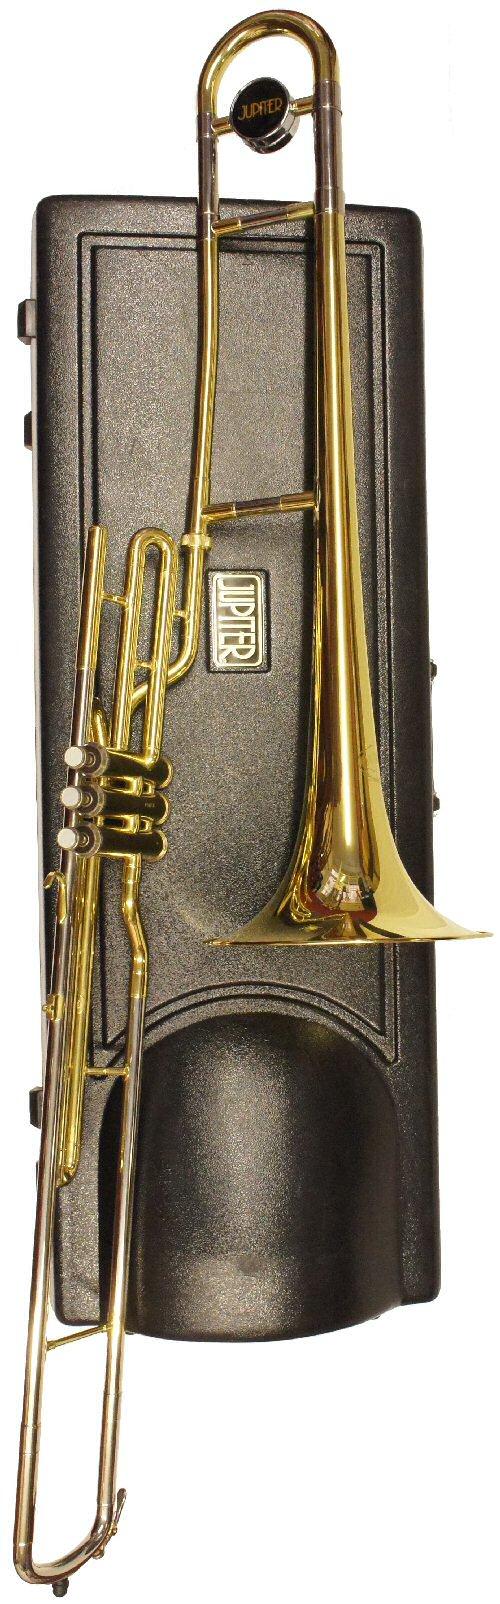 Second Hand Jupiter Valve Trombone